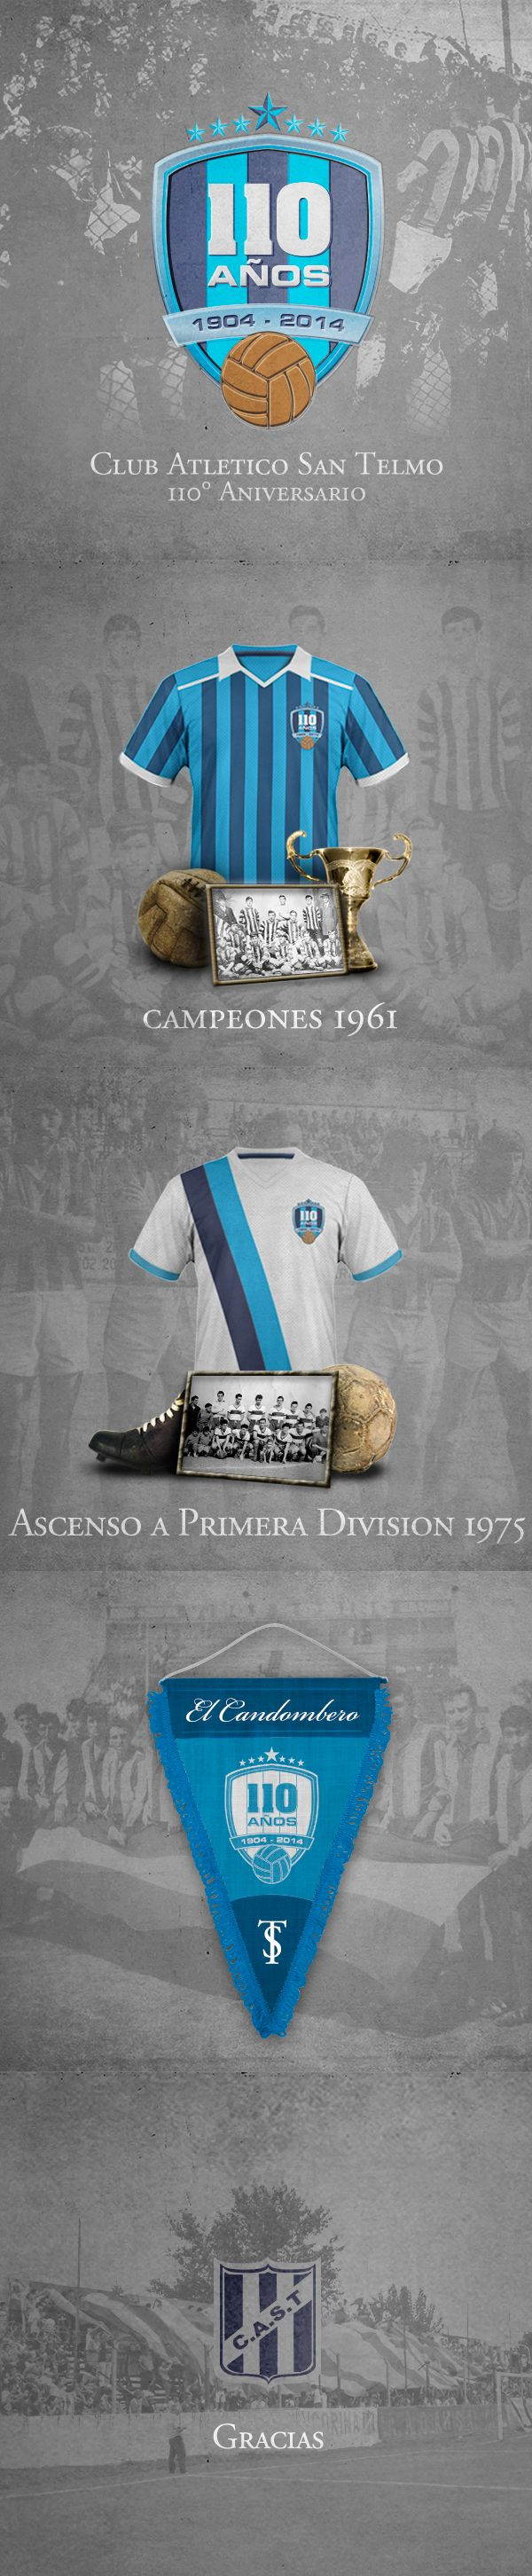 110º Aniversario del Club Atlético San Telmo on Behance